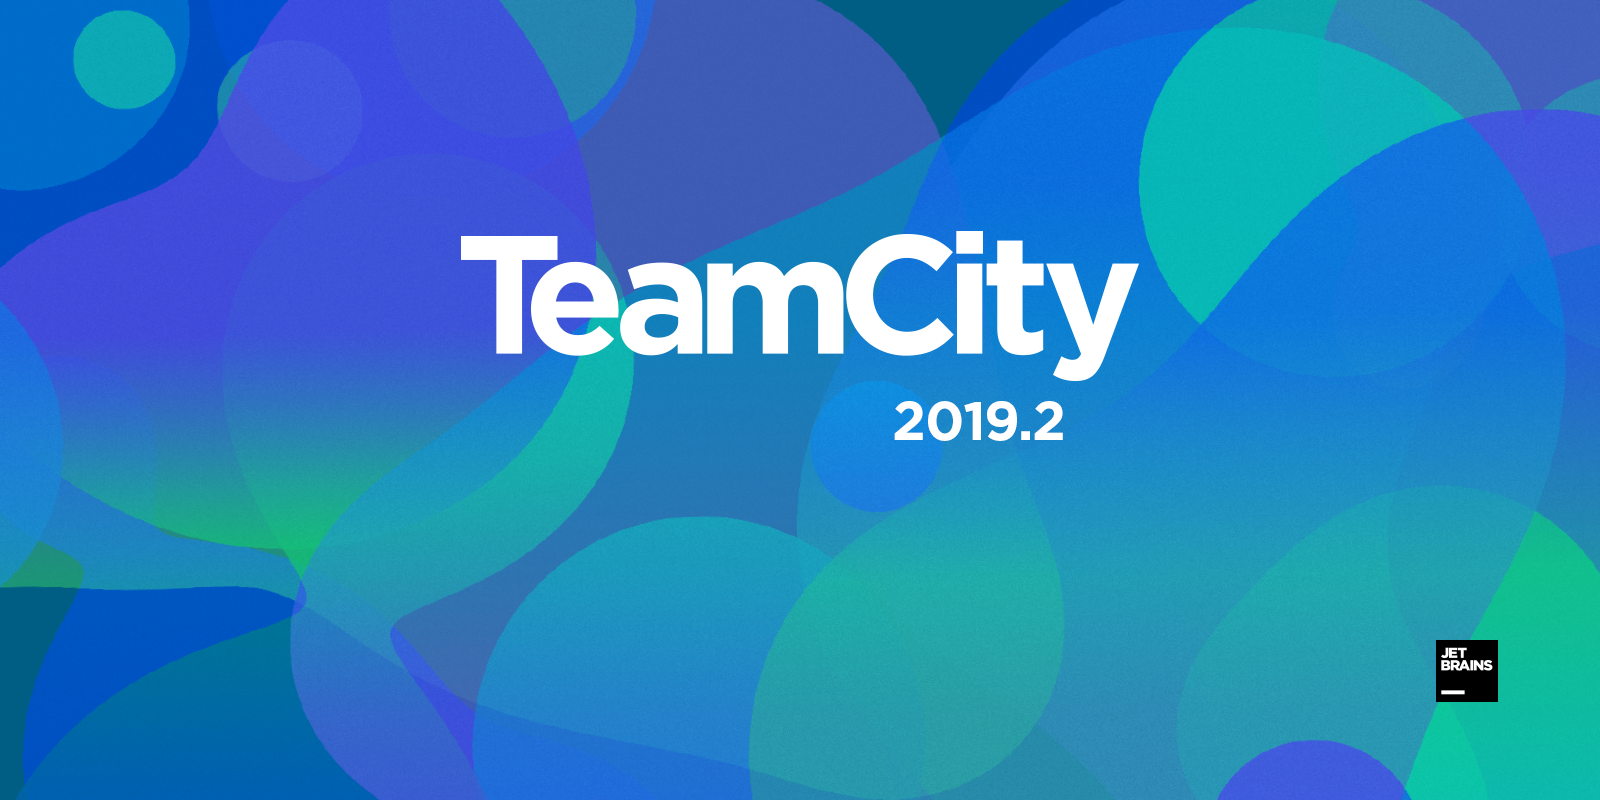 blog_teamcity-2019.2